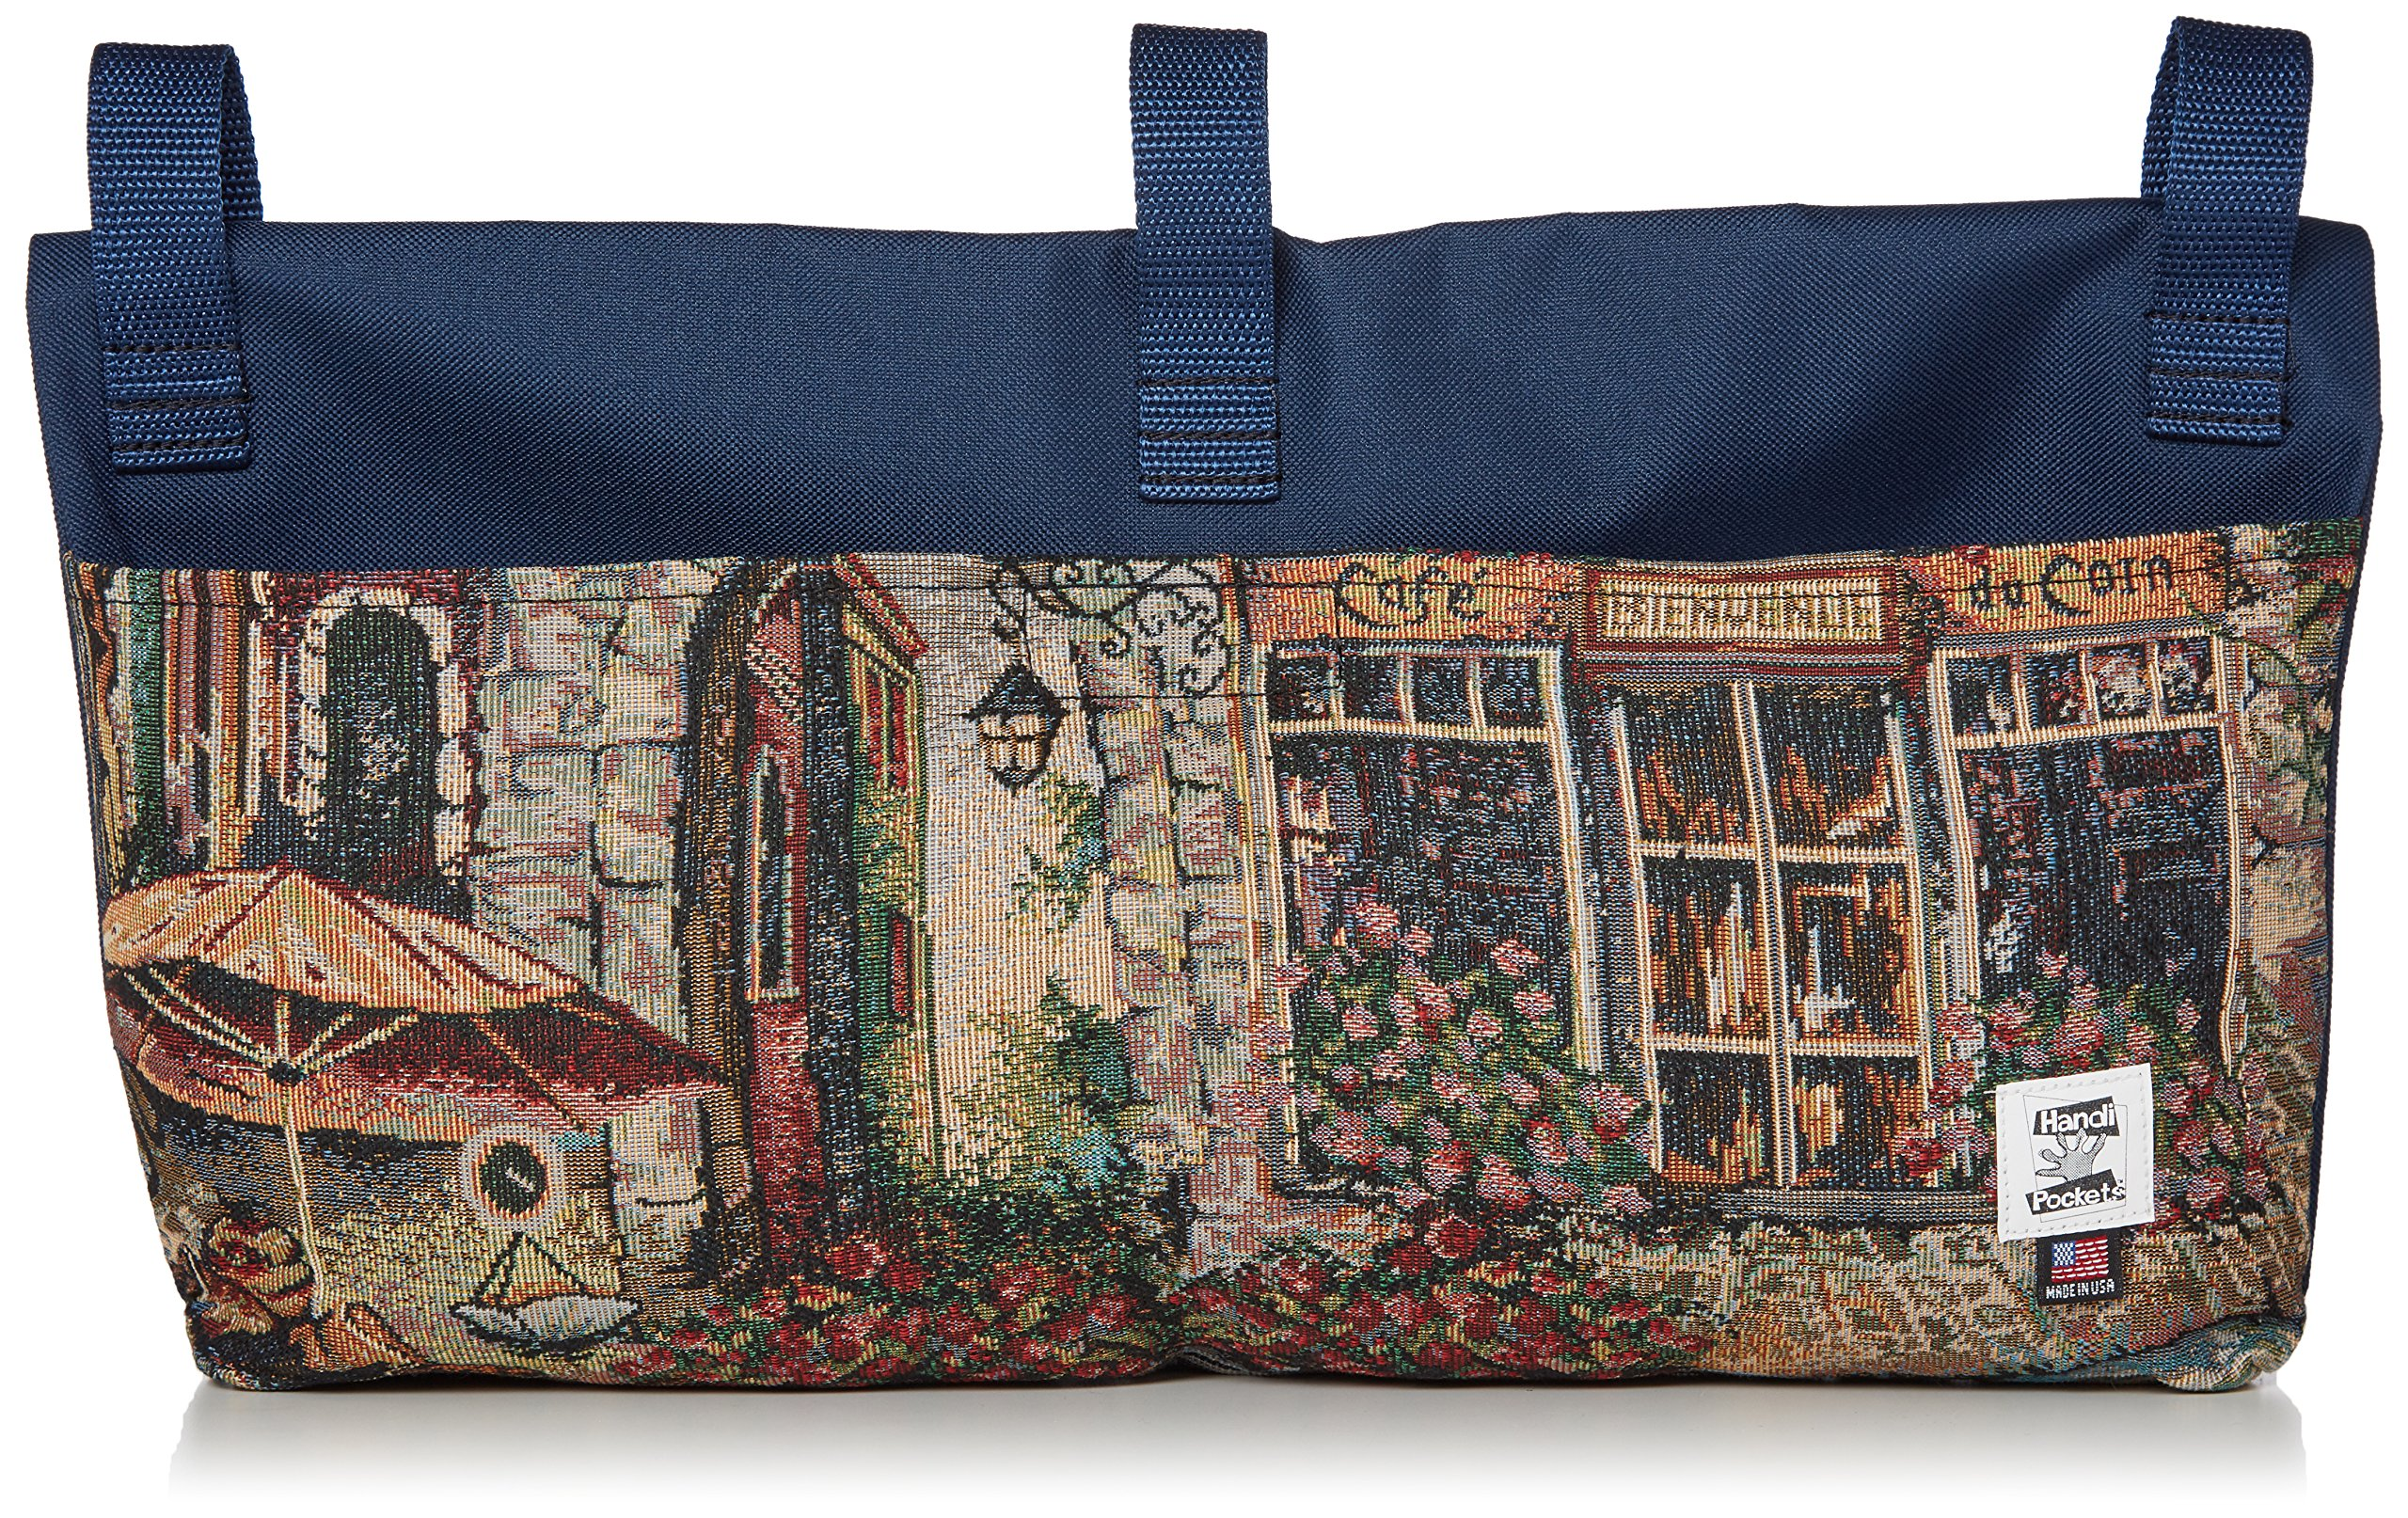 Handi Pockets 2c5bt Storage Accessory Walker, Tapestry, Bistro with Flap